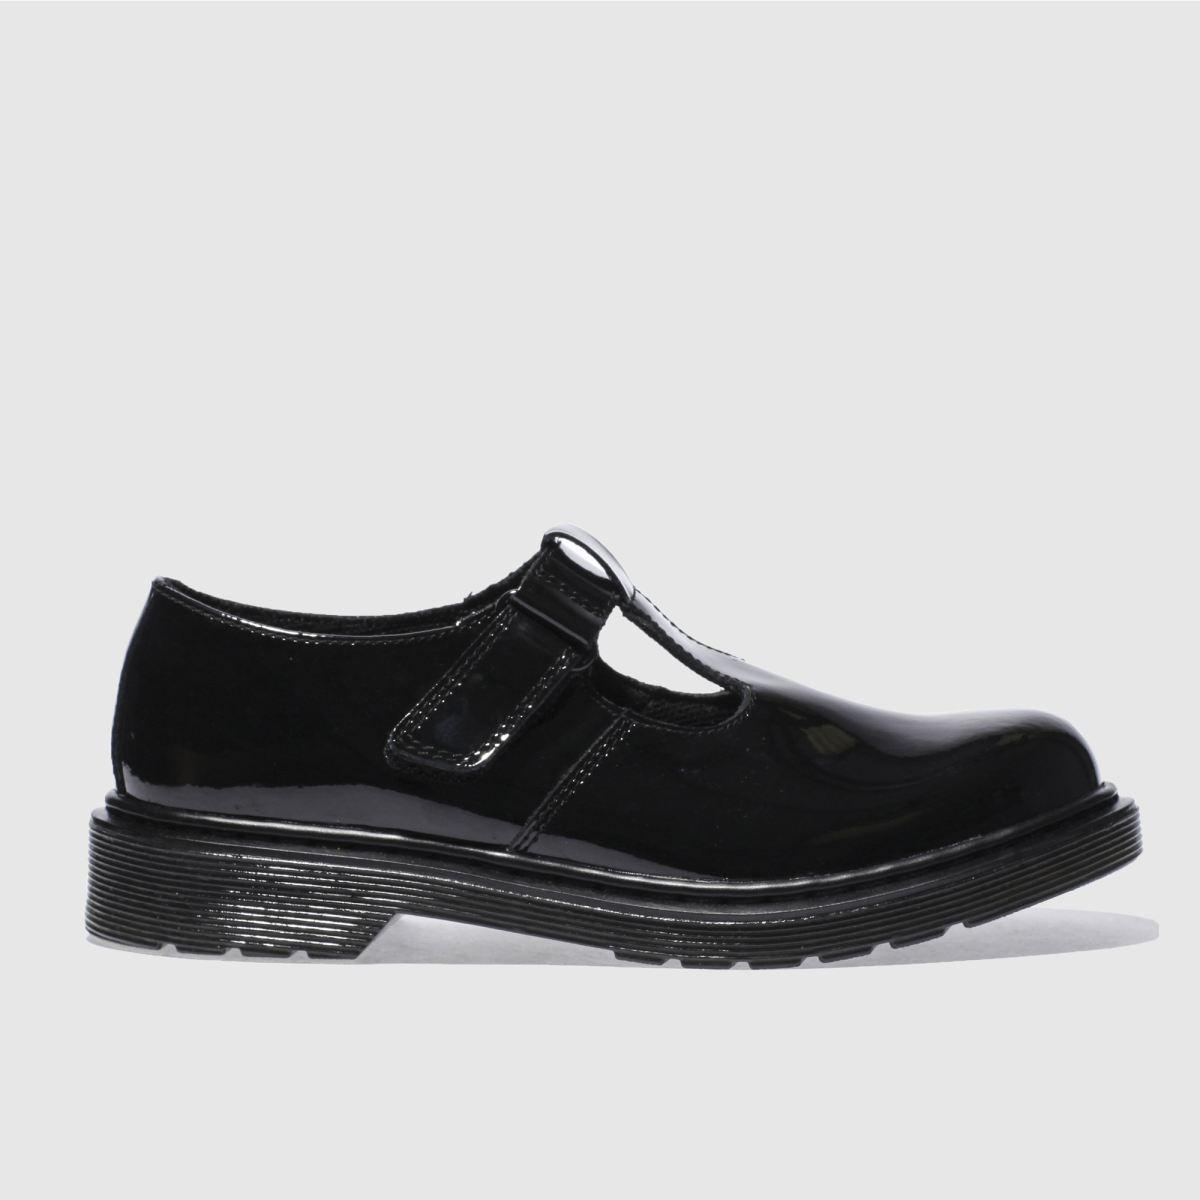 Dr Martens Black Ailis Girls Youth Shoes